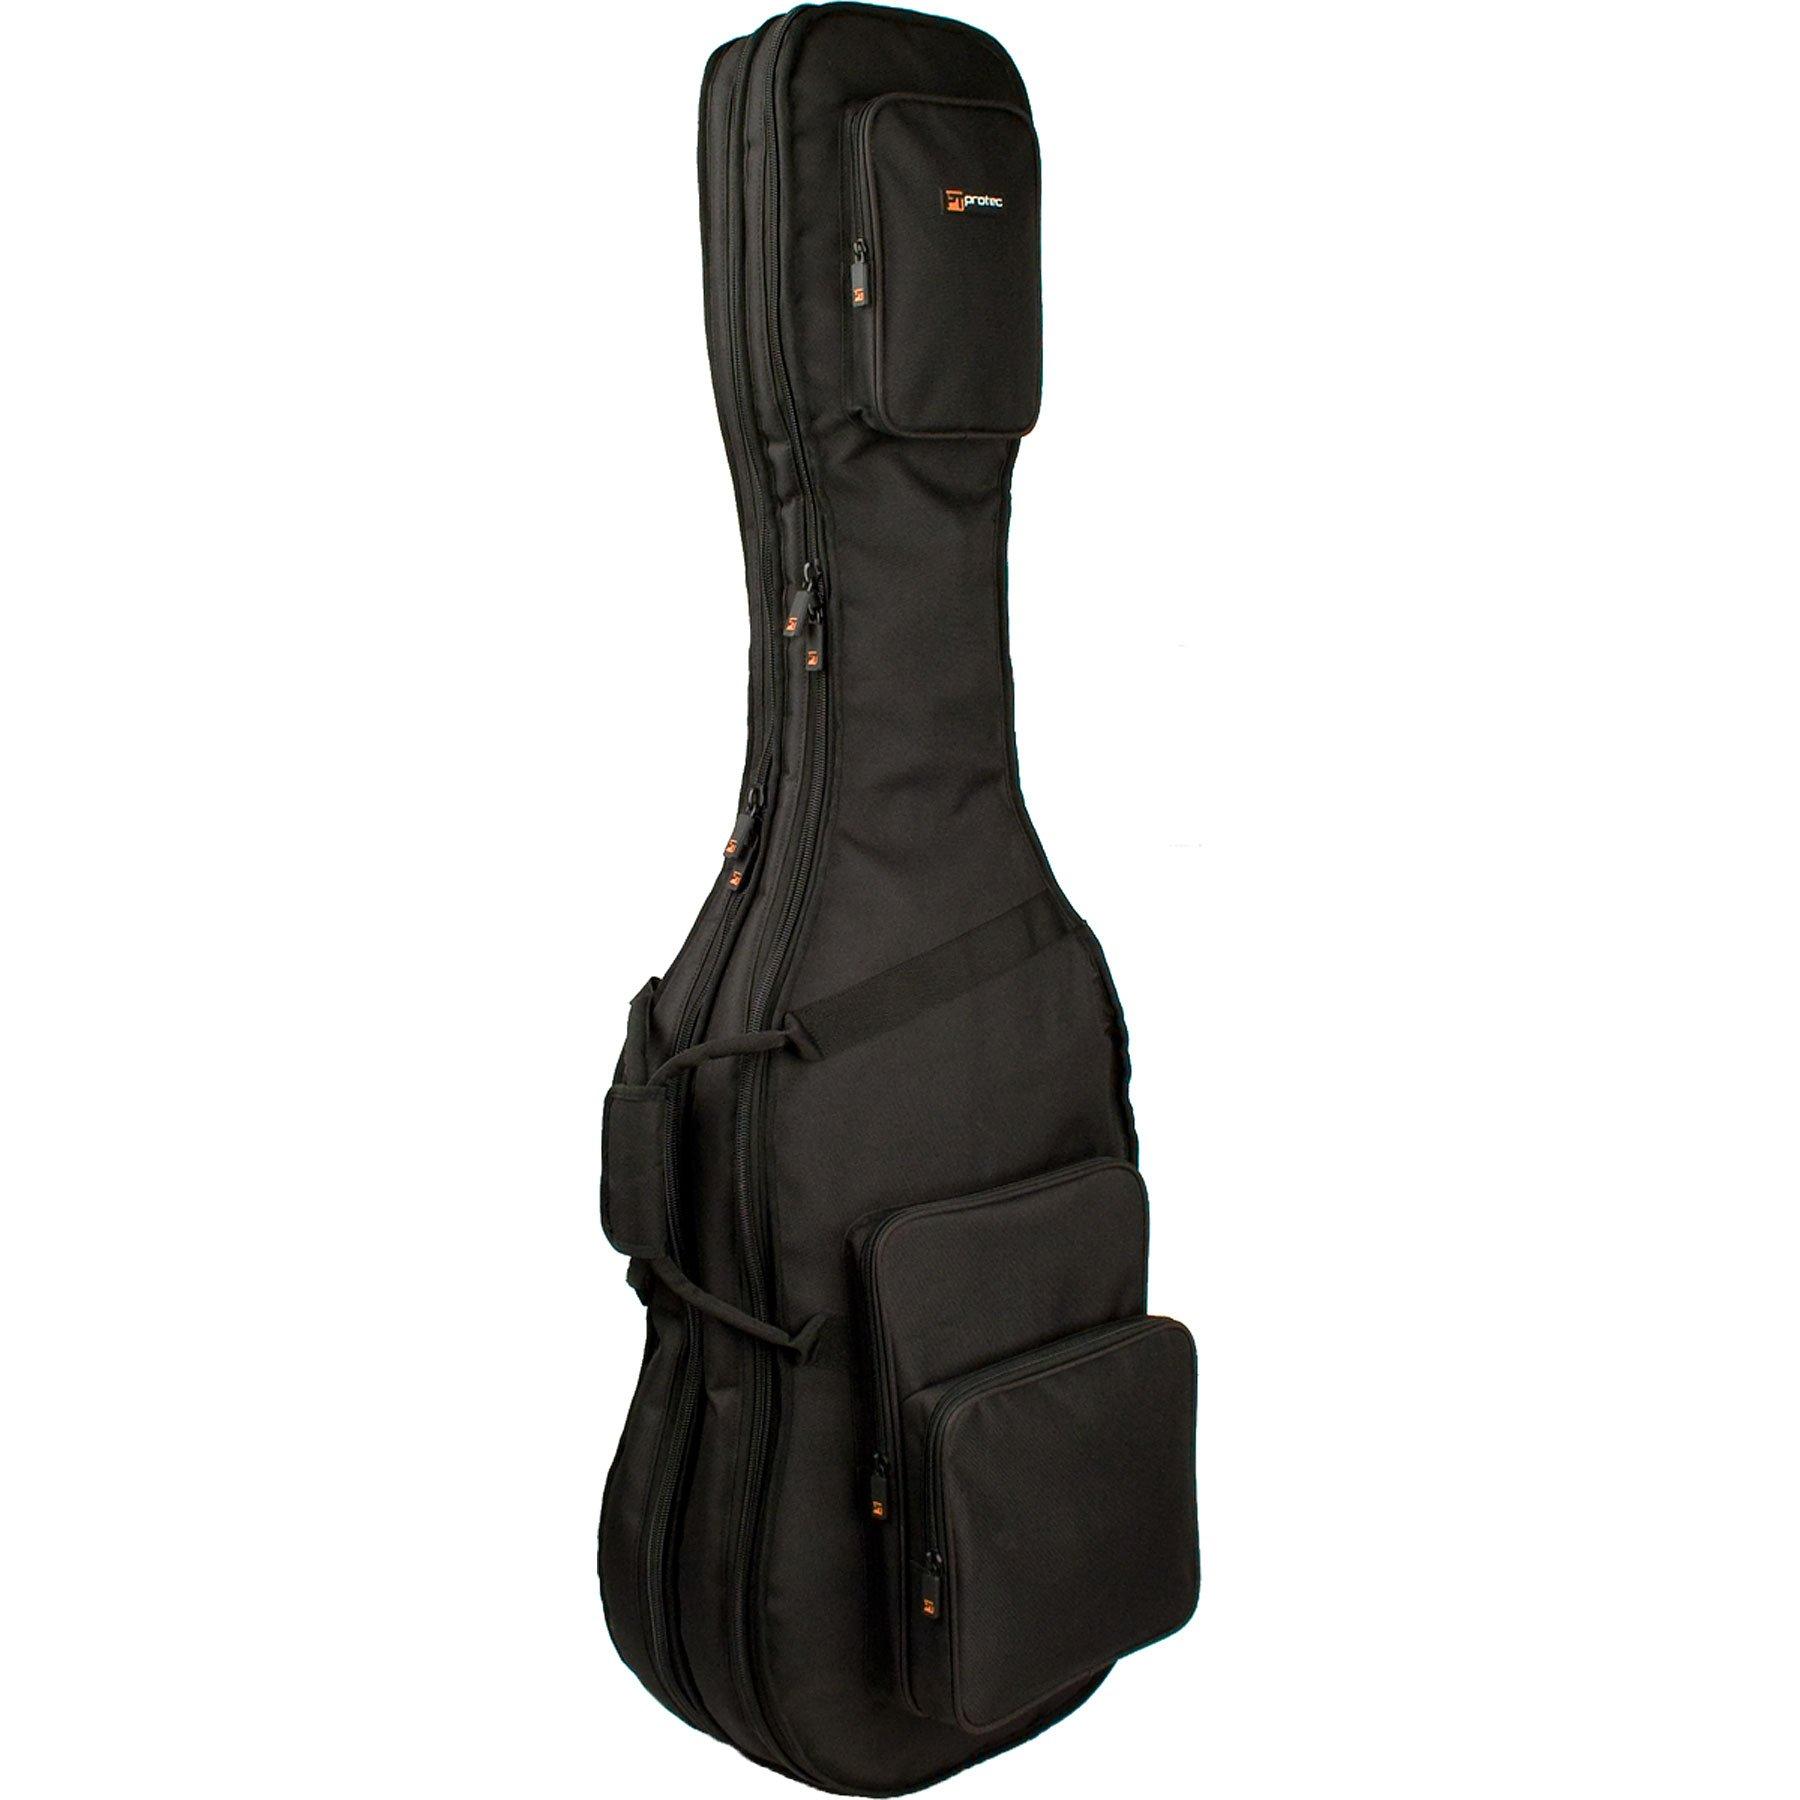 Pro Tec CF233DBL Double Bass Guitar Gig Bag - Gold Series